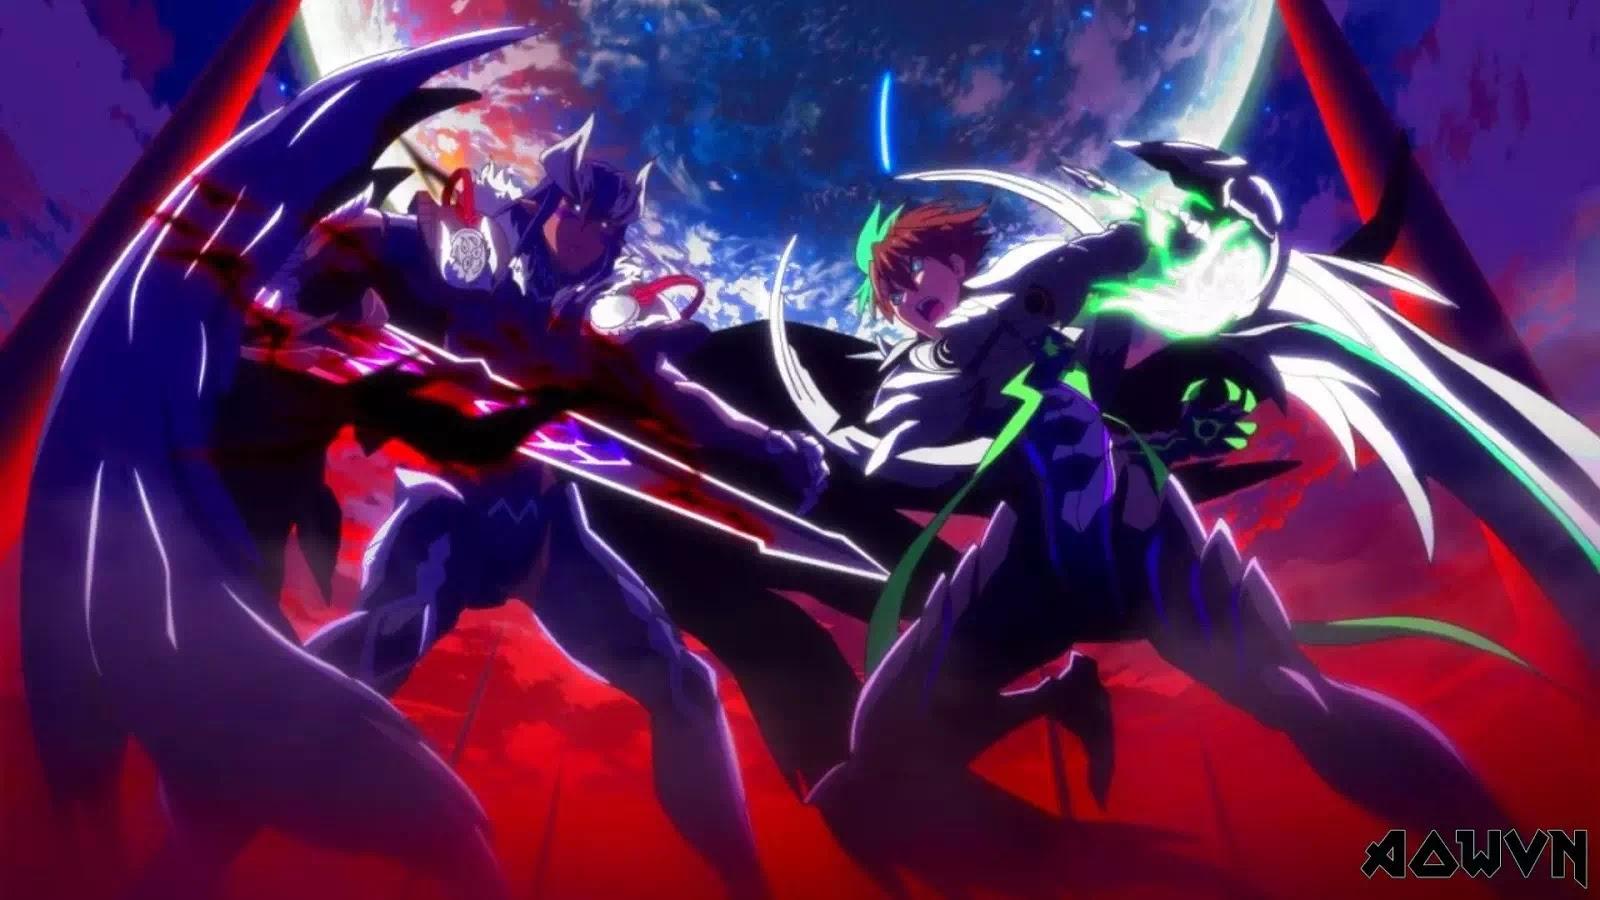 AowVN%2B%25283%2529 - [ Anime 3gp Mp4 ] Shinmai Maou no Testament BD SS1 + SS2 + OVA | Vietsub Ecchi Harem 17+